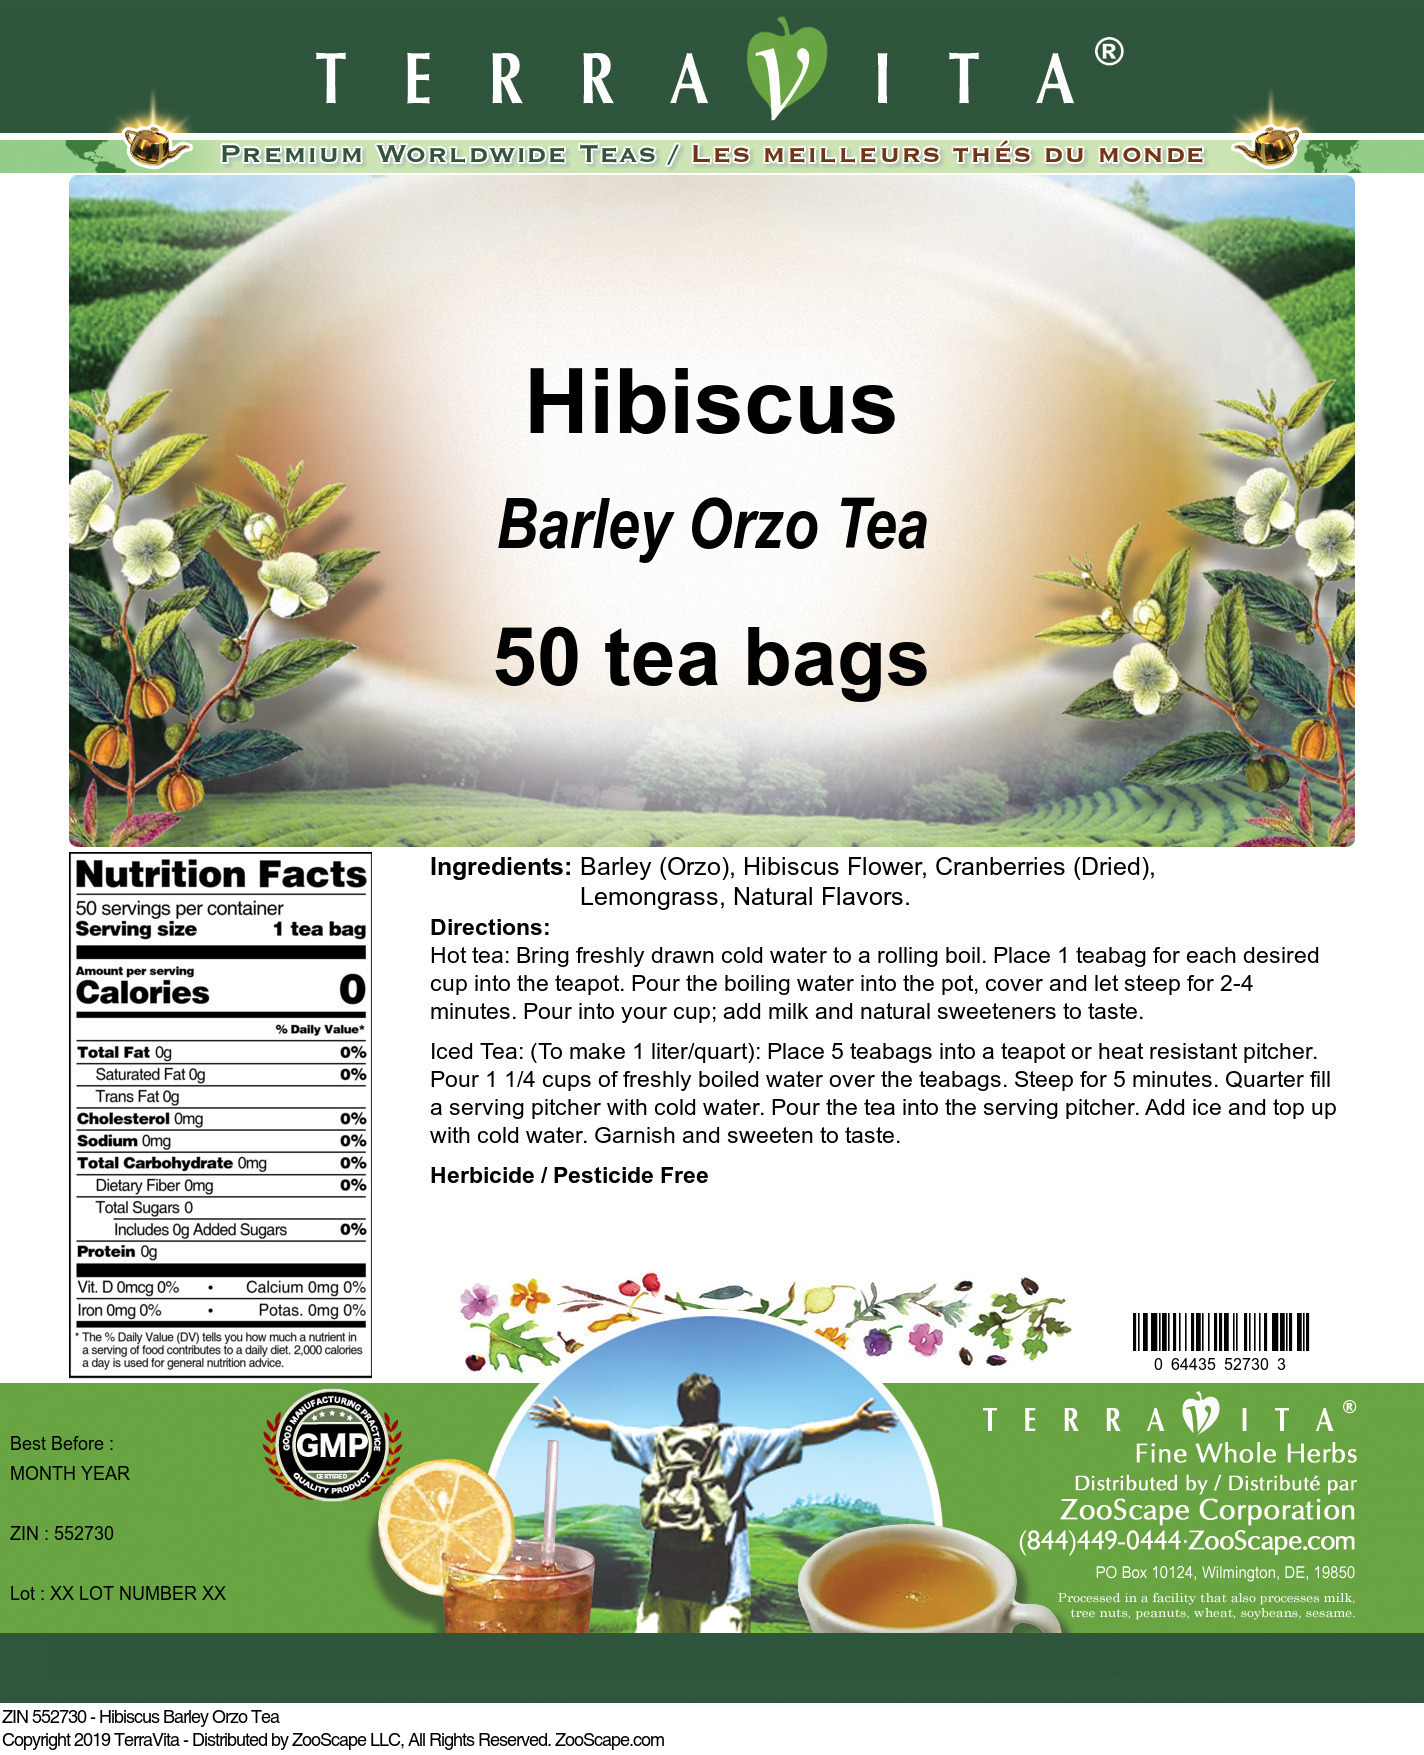 Hibiscus Barley Orzo Tea